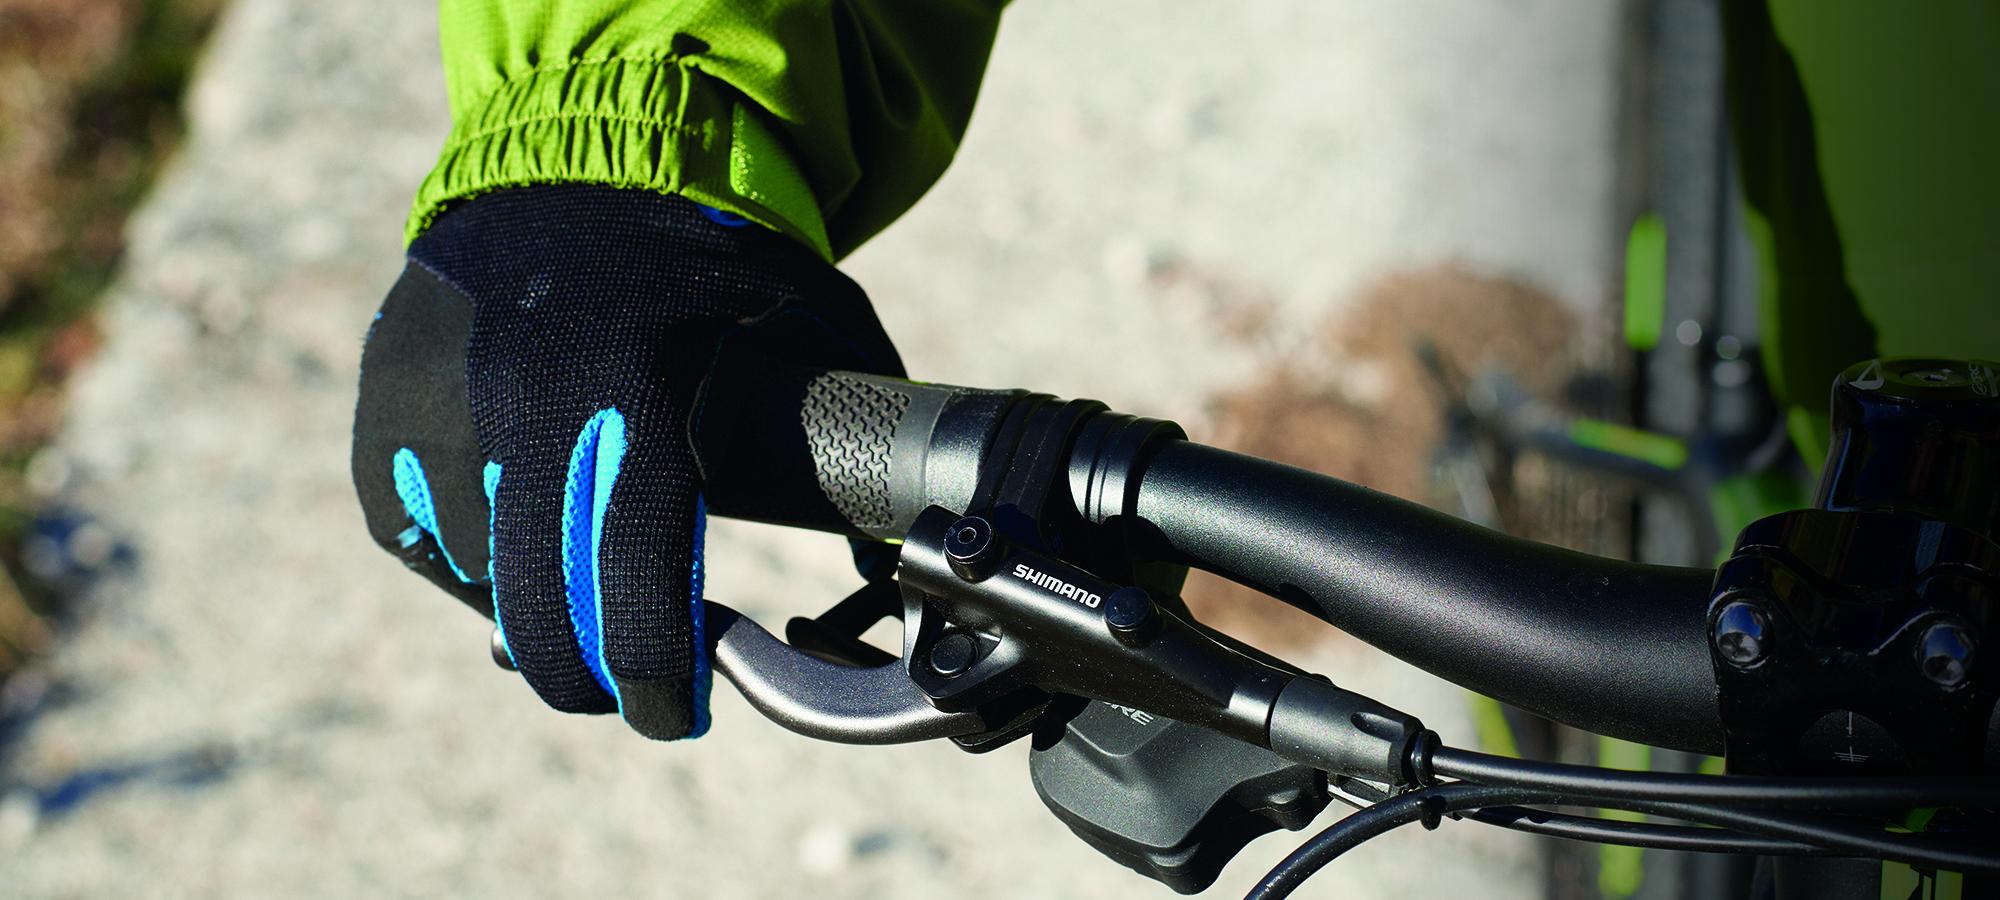 Orbea eMX 24 Kids e-bike